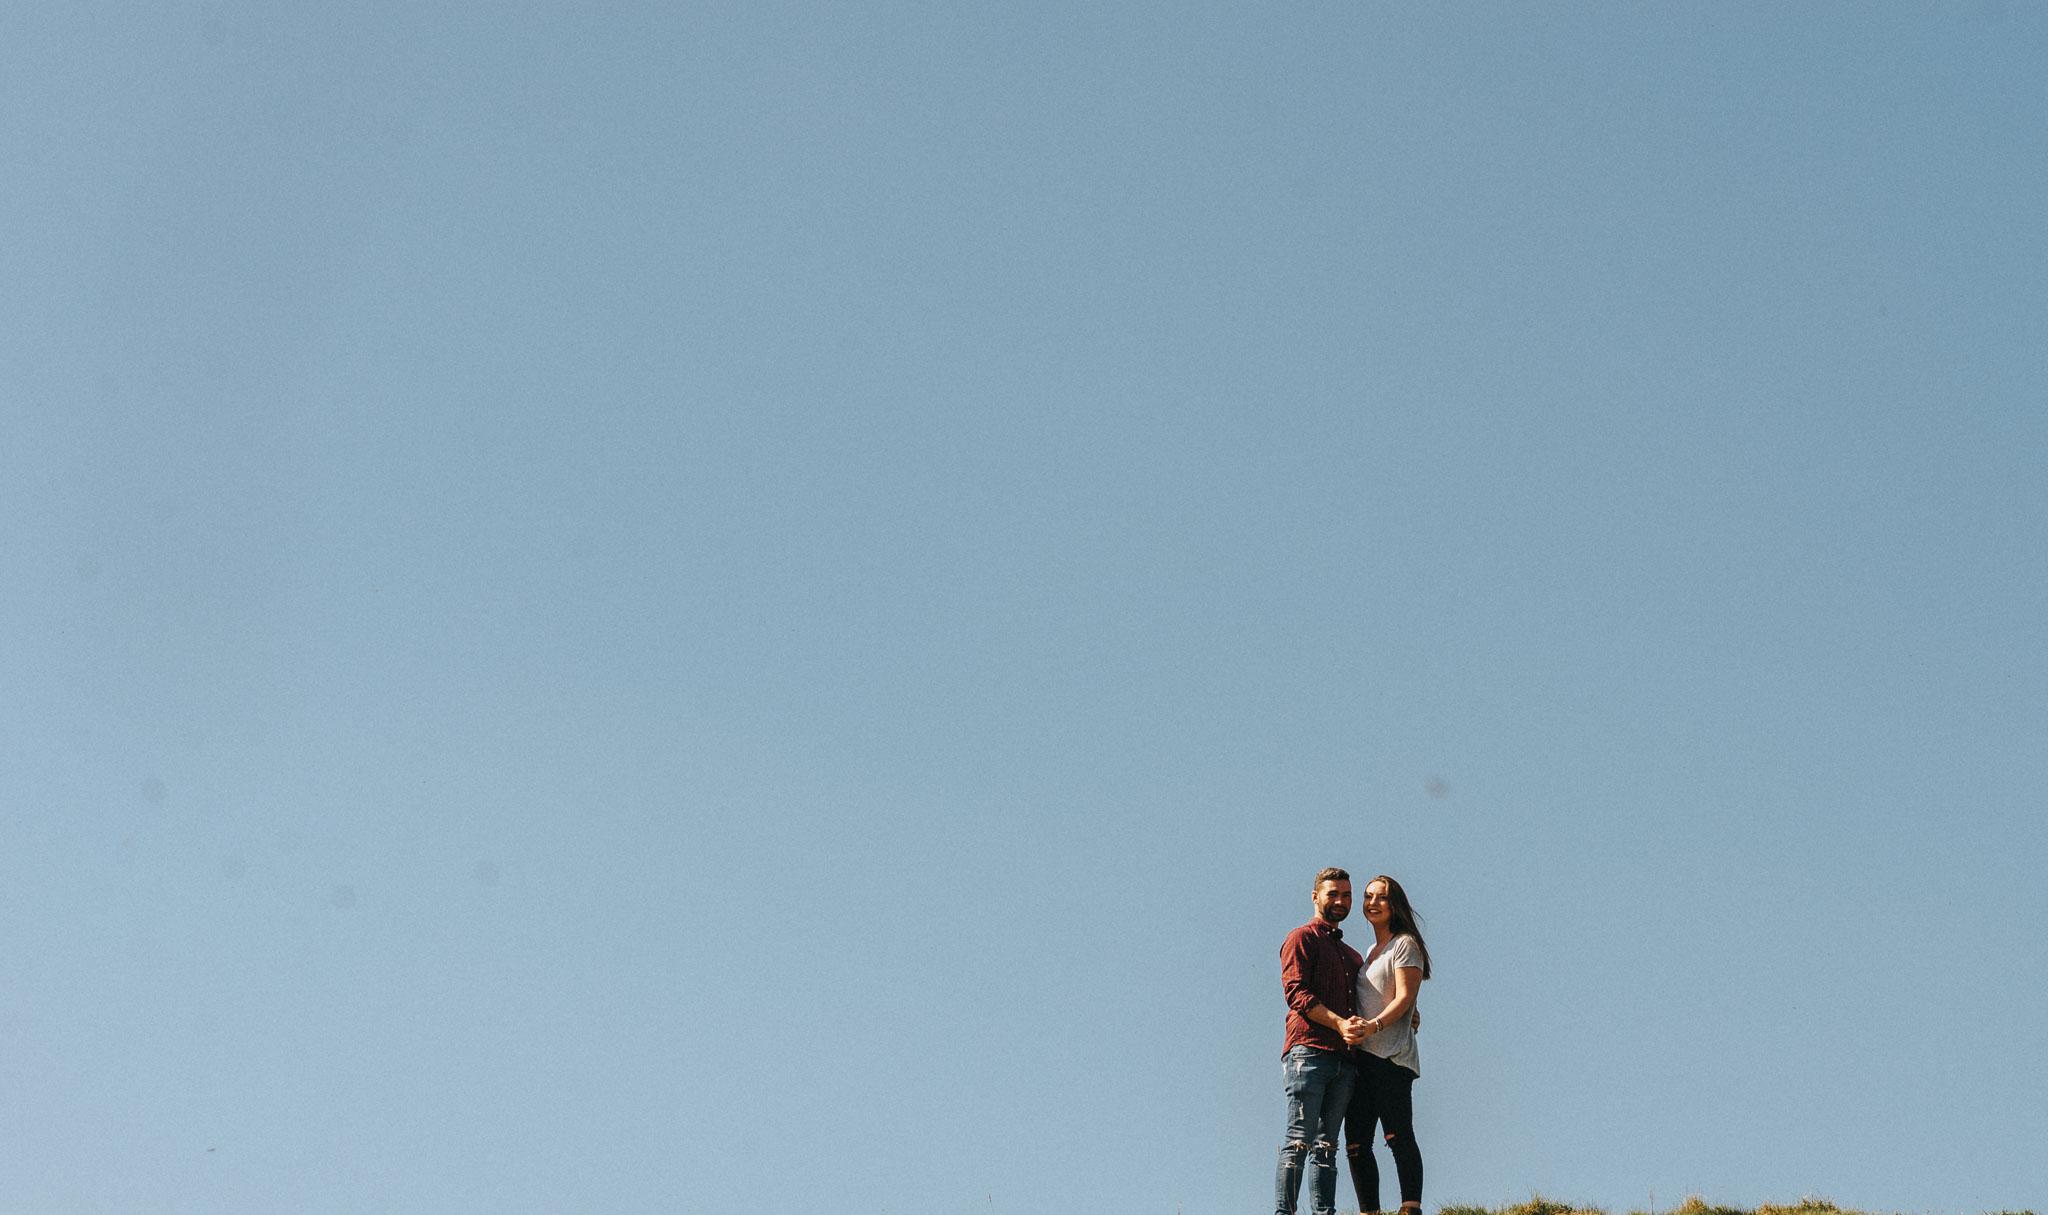 alternative-wedding-photography-manchester-wedding-photographer (5).jpg